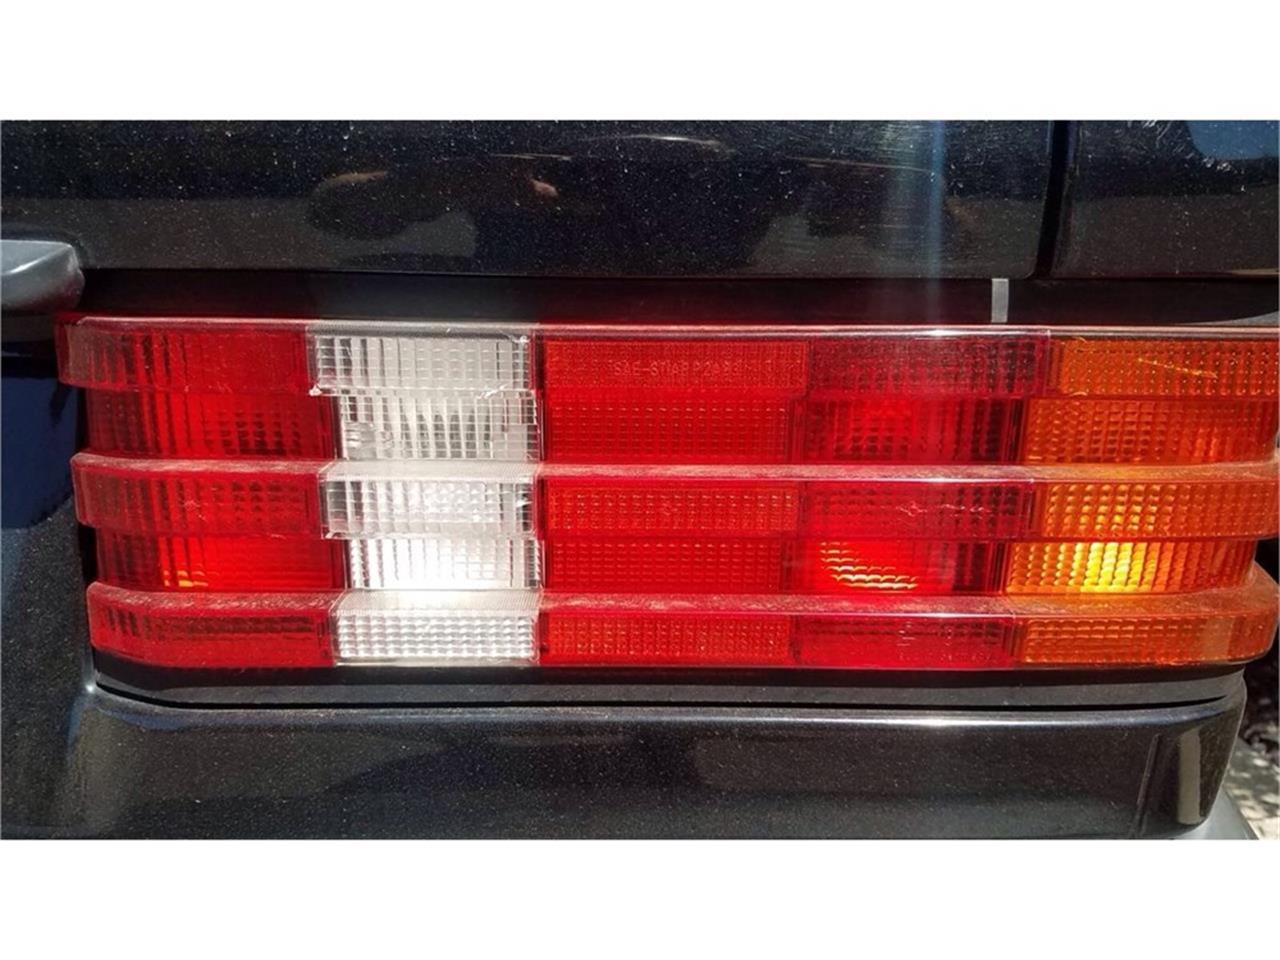 1993 Mercedes-Benz 190E (CC-1409597) for sale in Ashland, Oregon